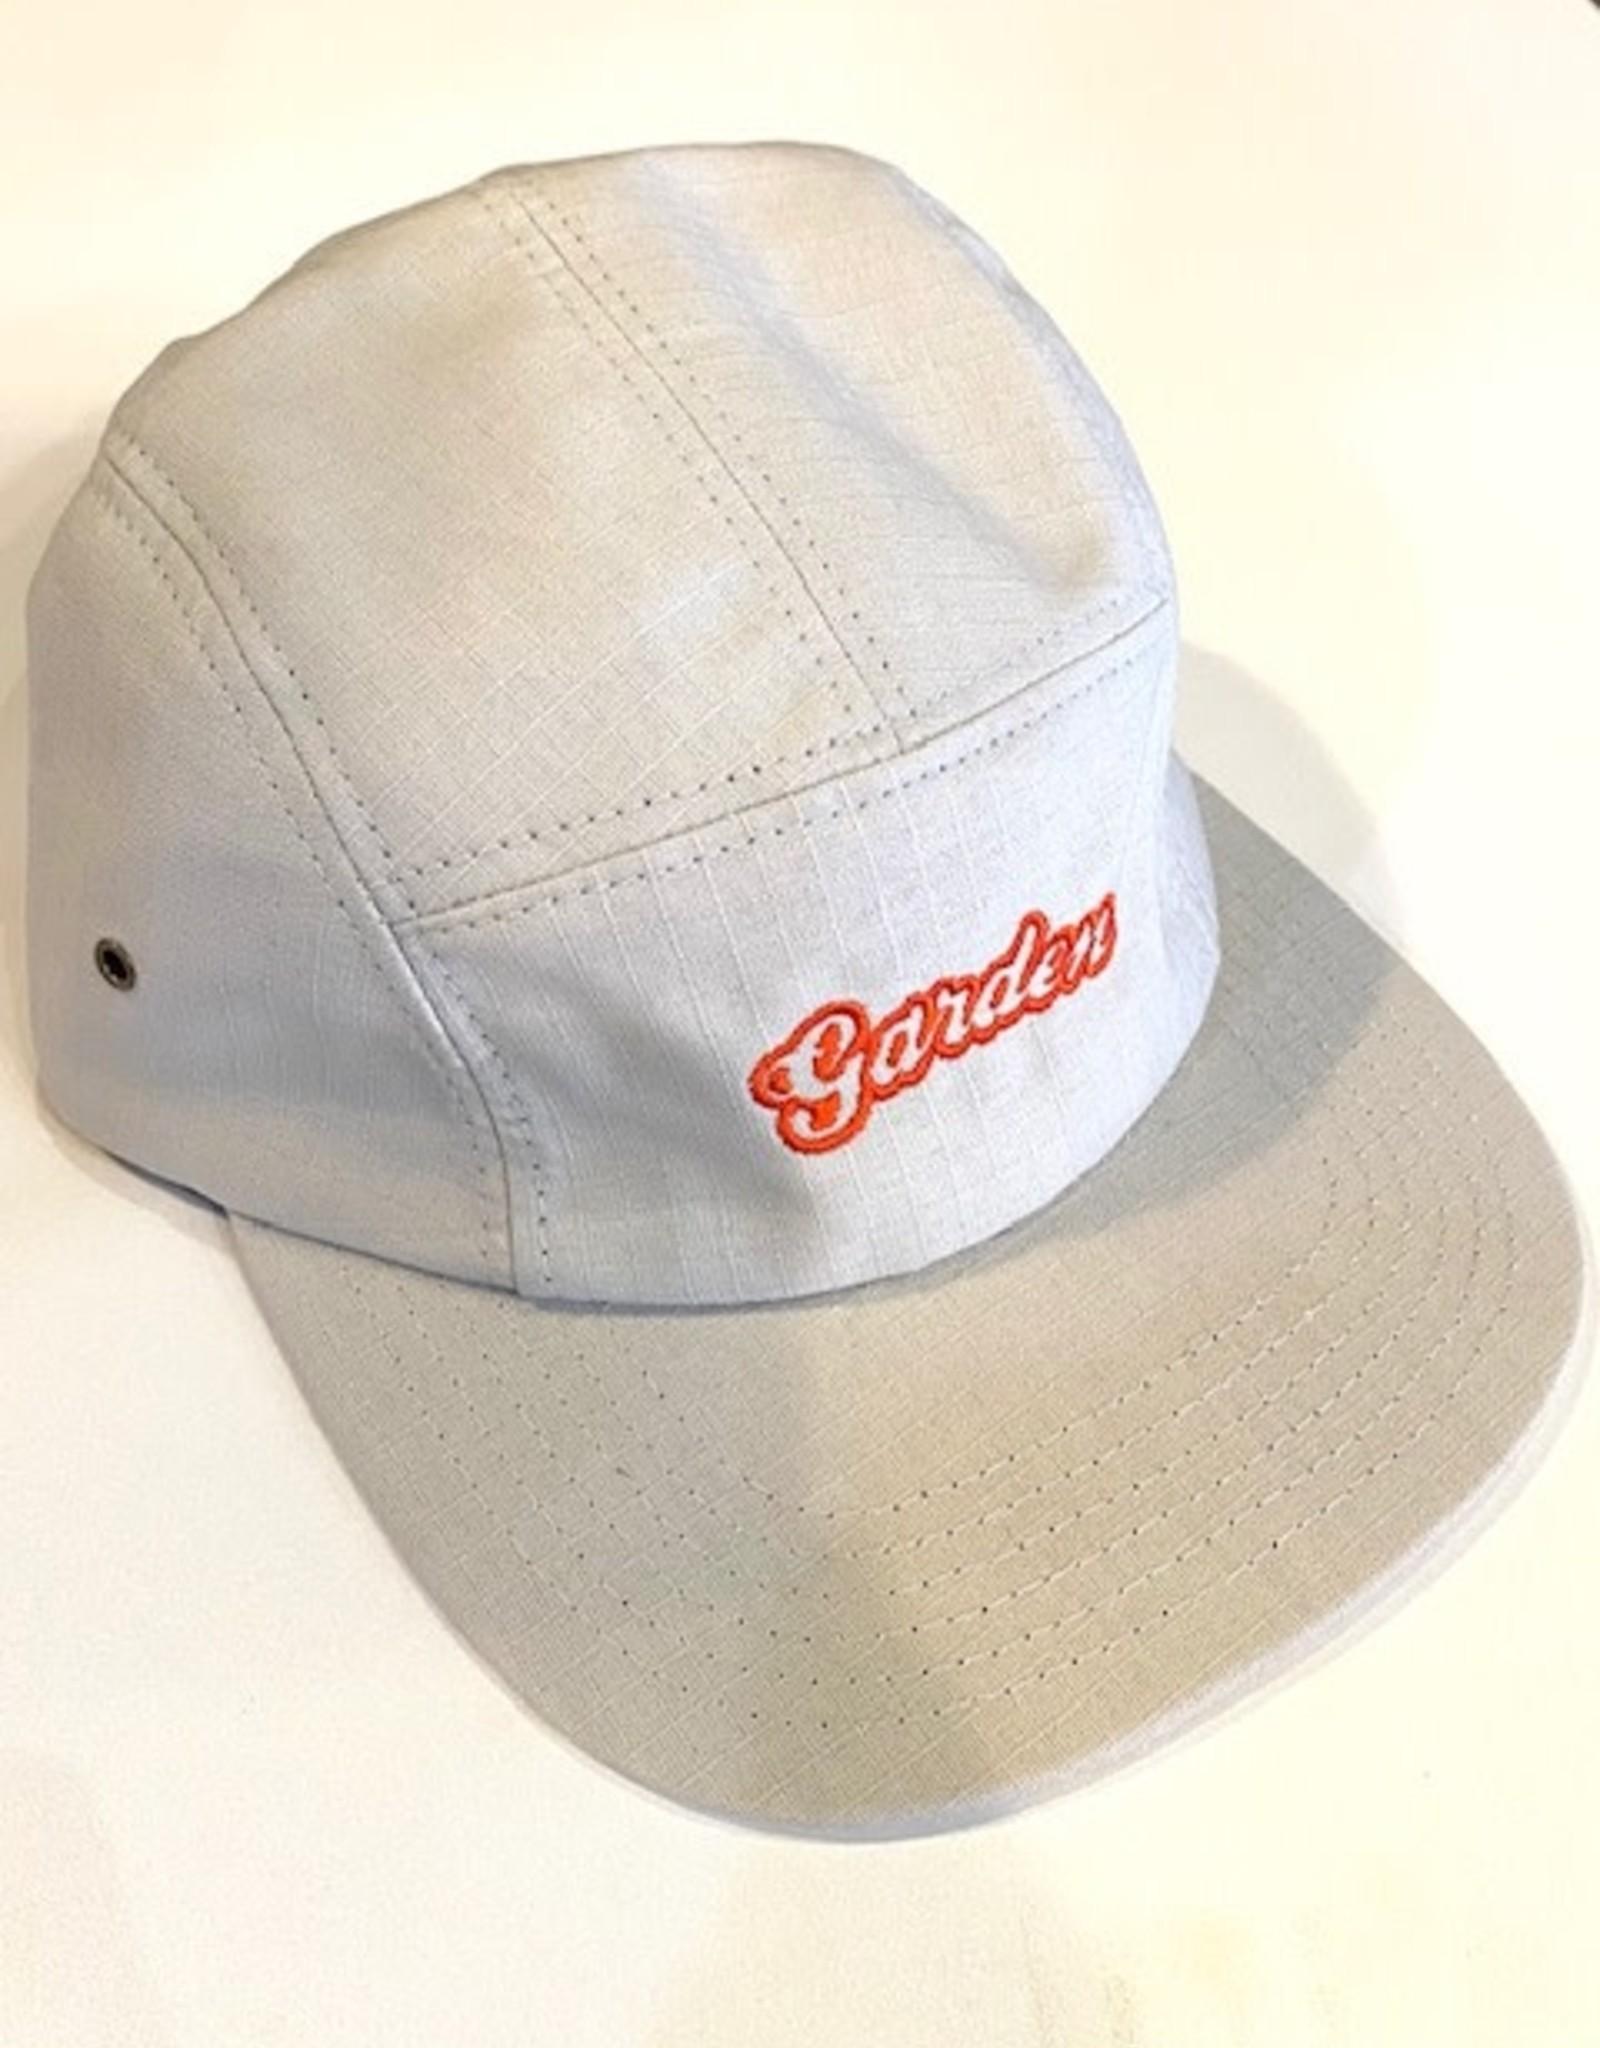 GARDEN GARDEN LIGHT GREY W/ ORANGE RIPSTOP 5 PANEL CLIPBACK HAT